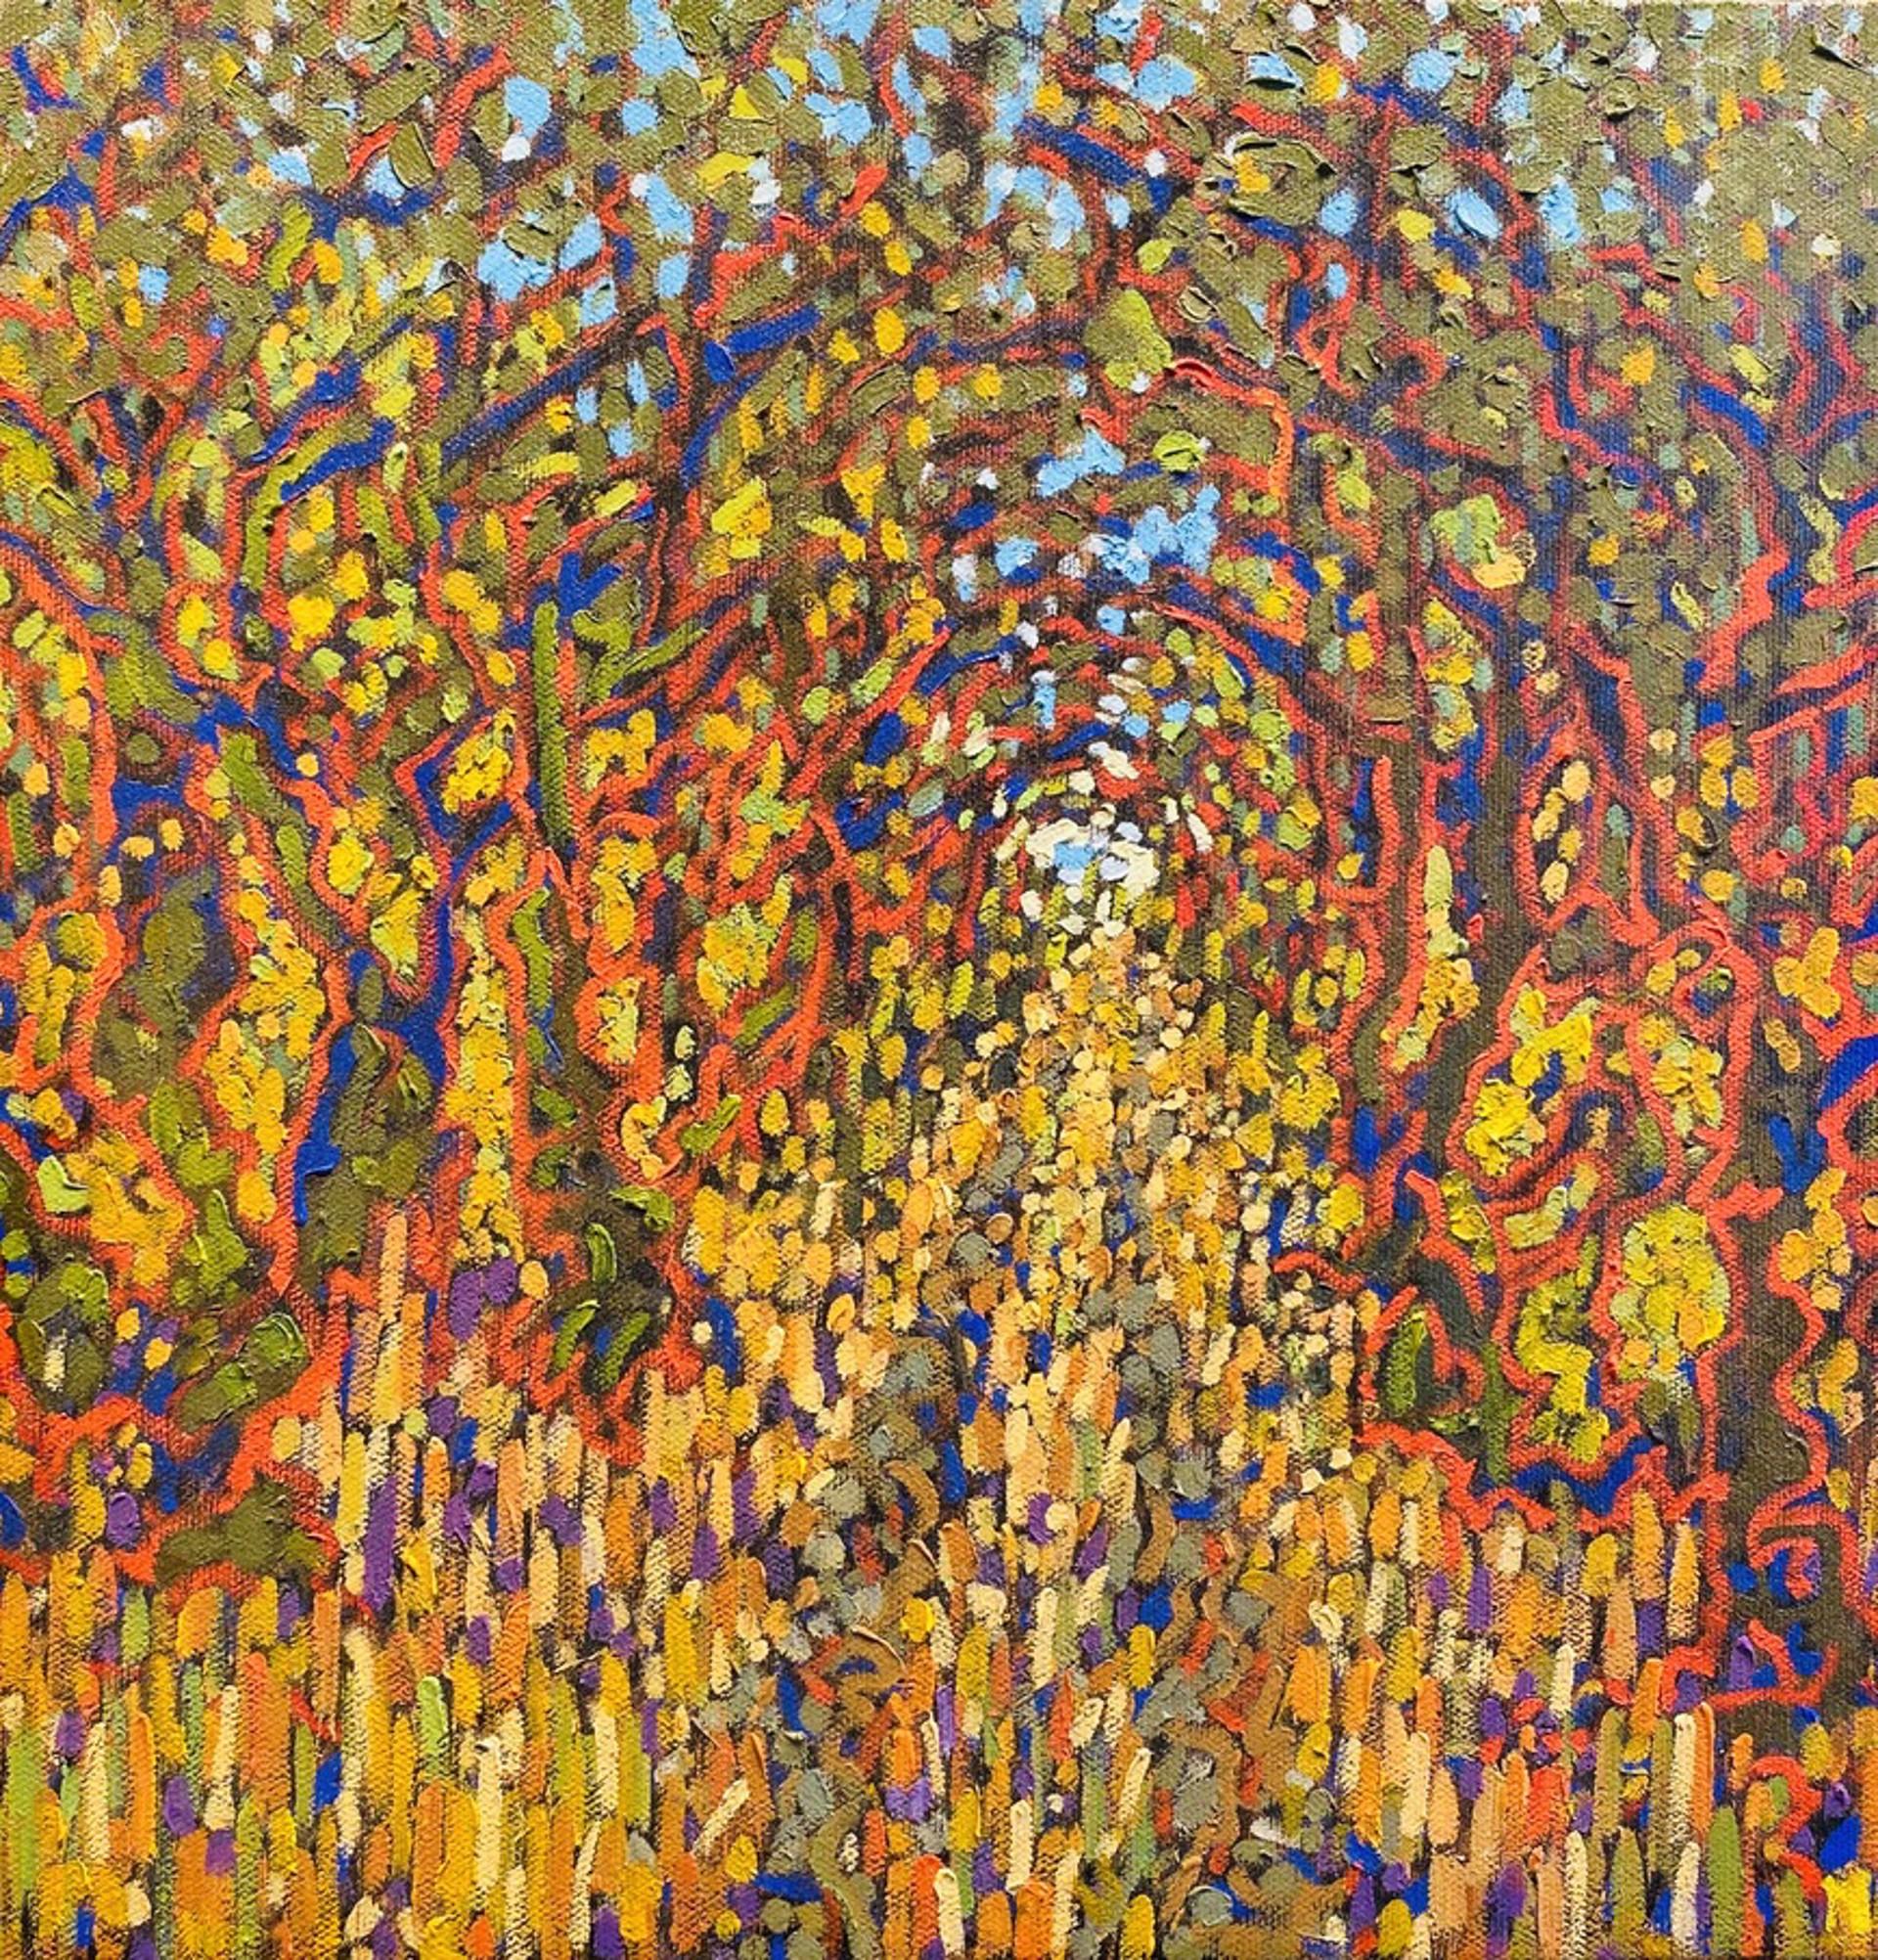 Woods and Path - National Seashore  by Nicholas Peterson-Davis